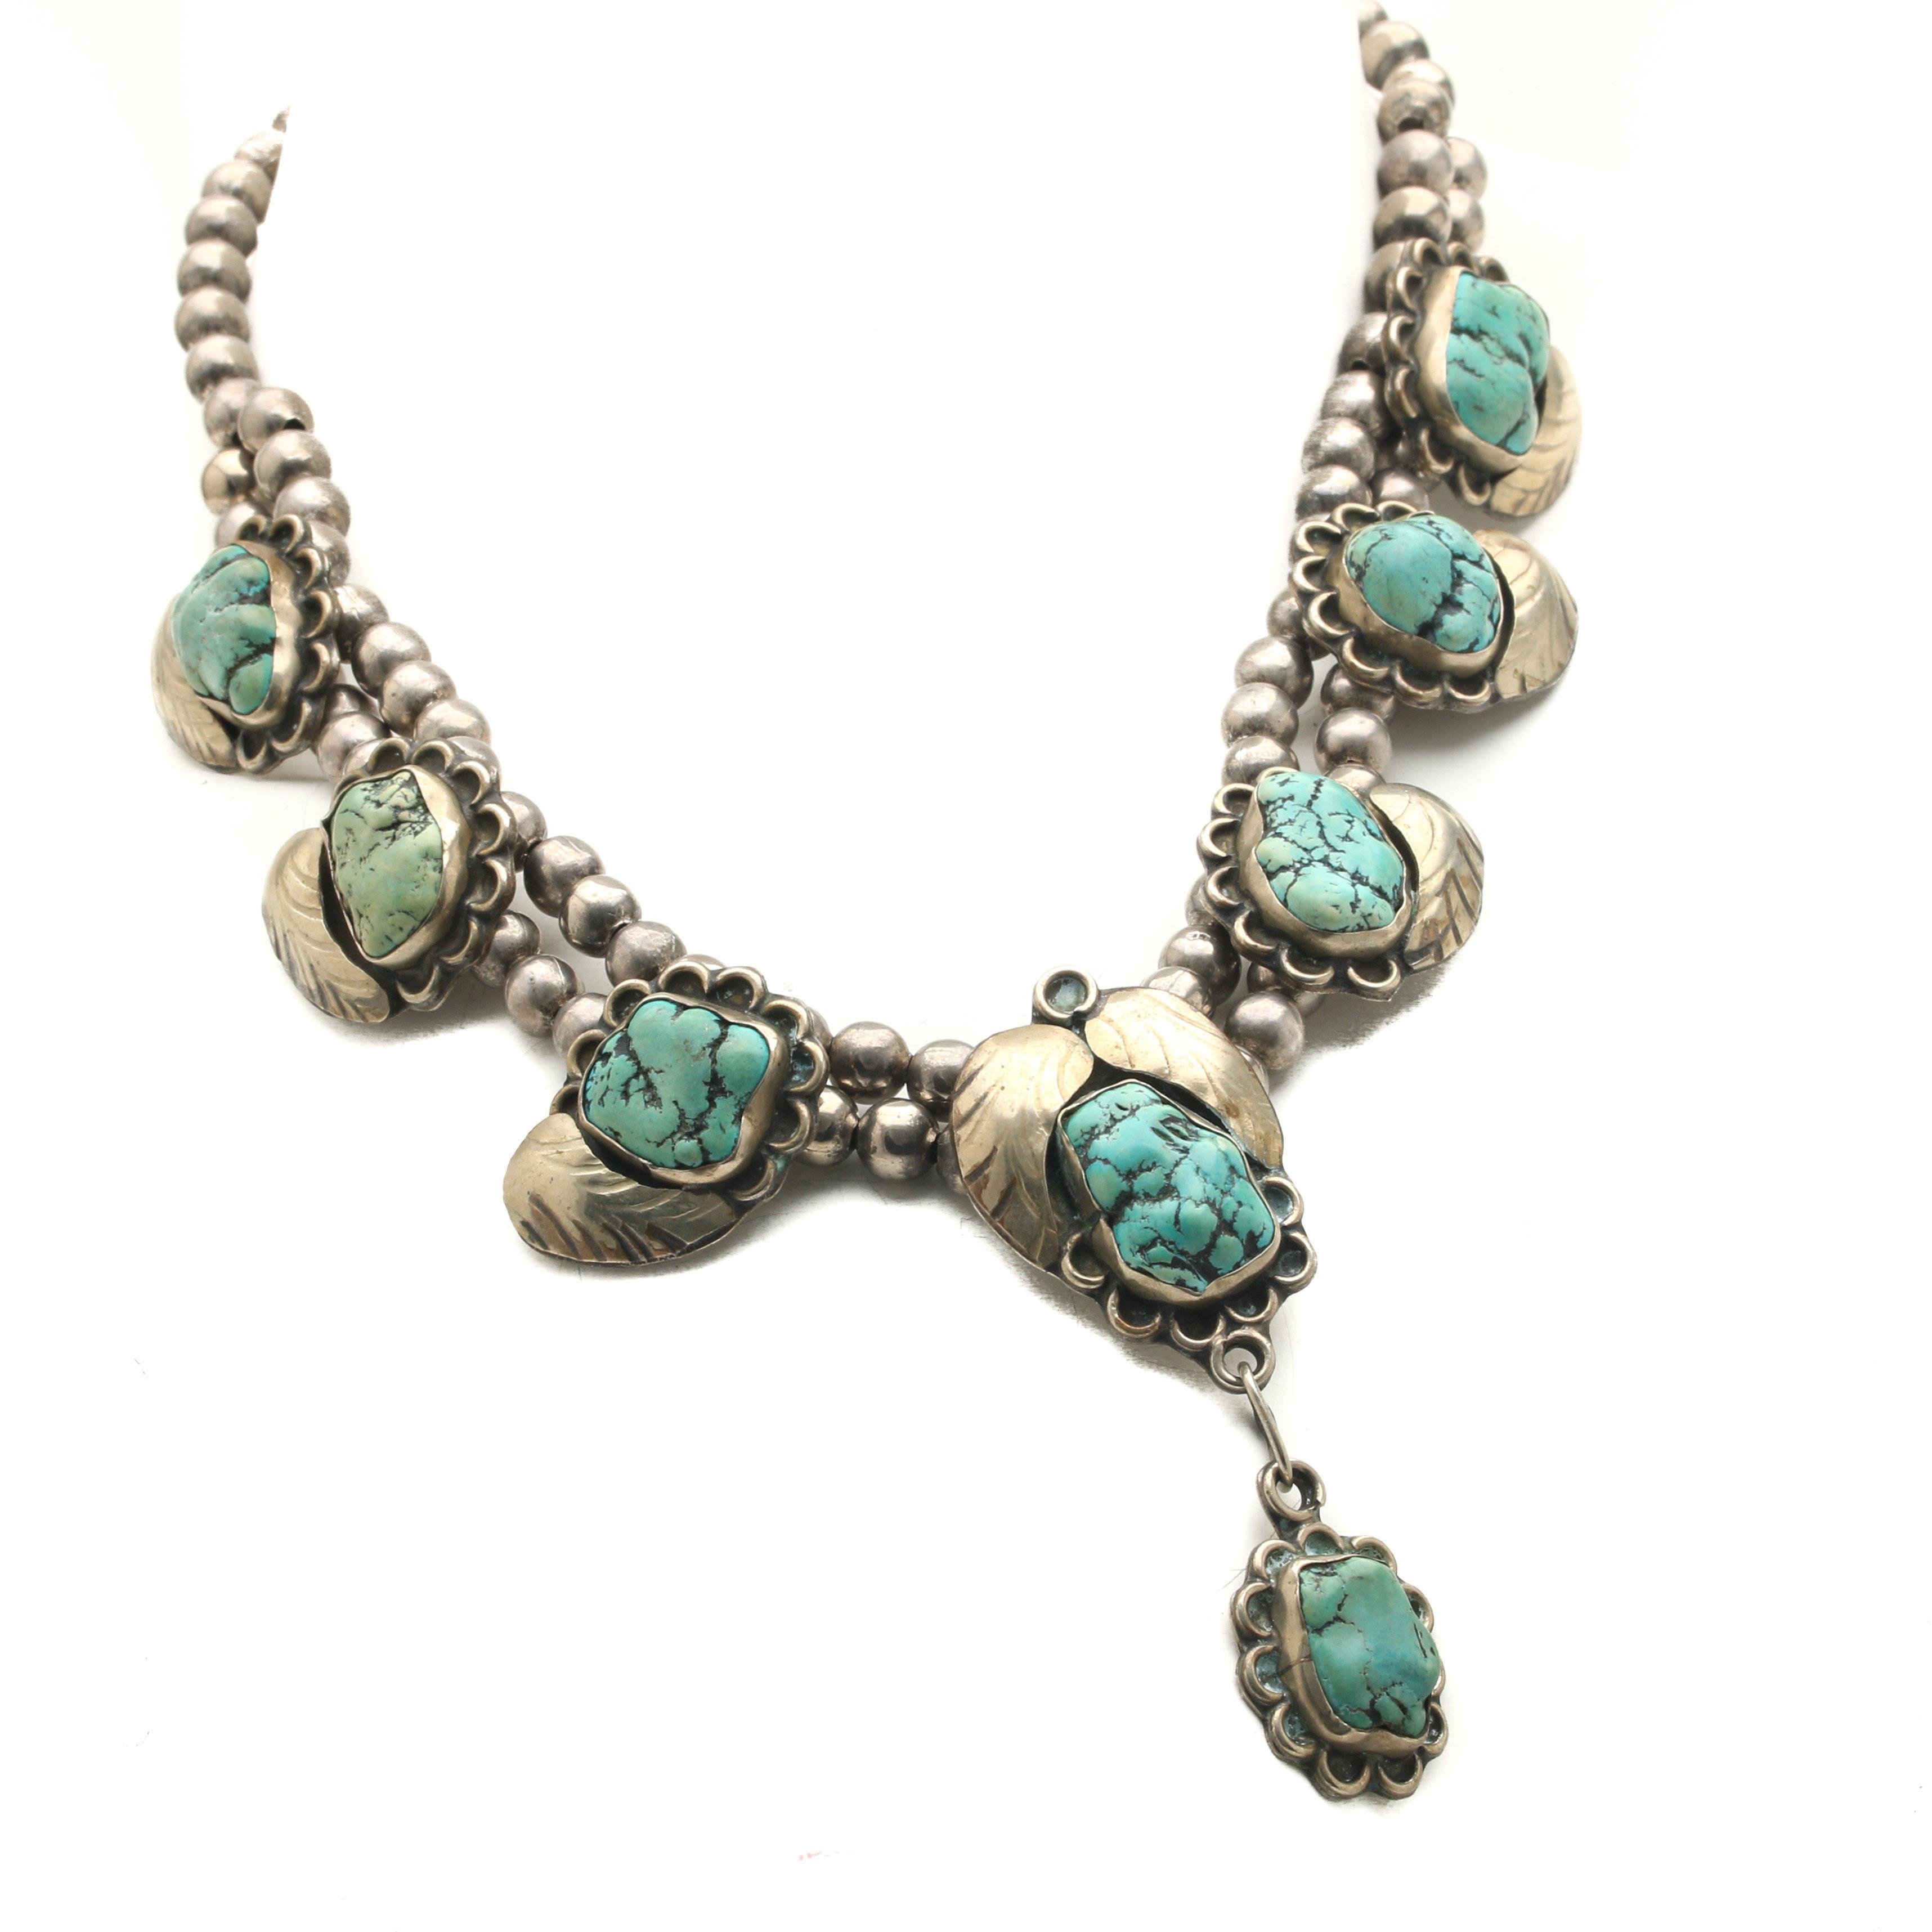 Vintage Southwestern Style Magnesite Necklace